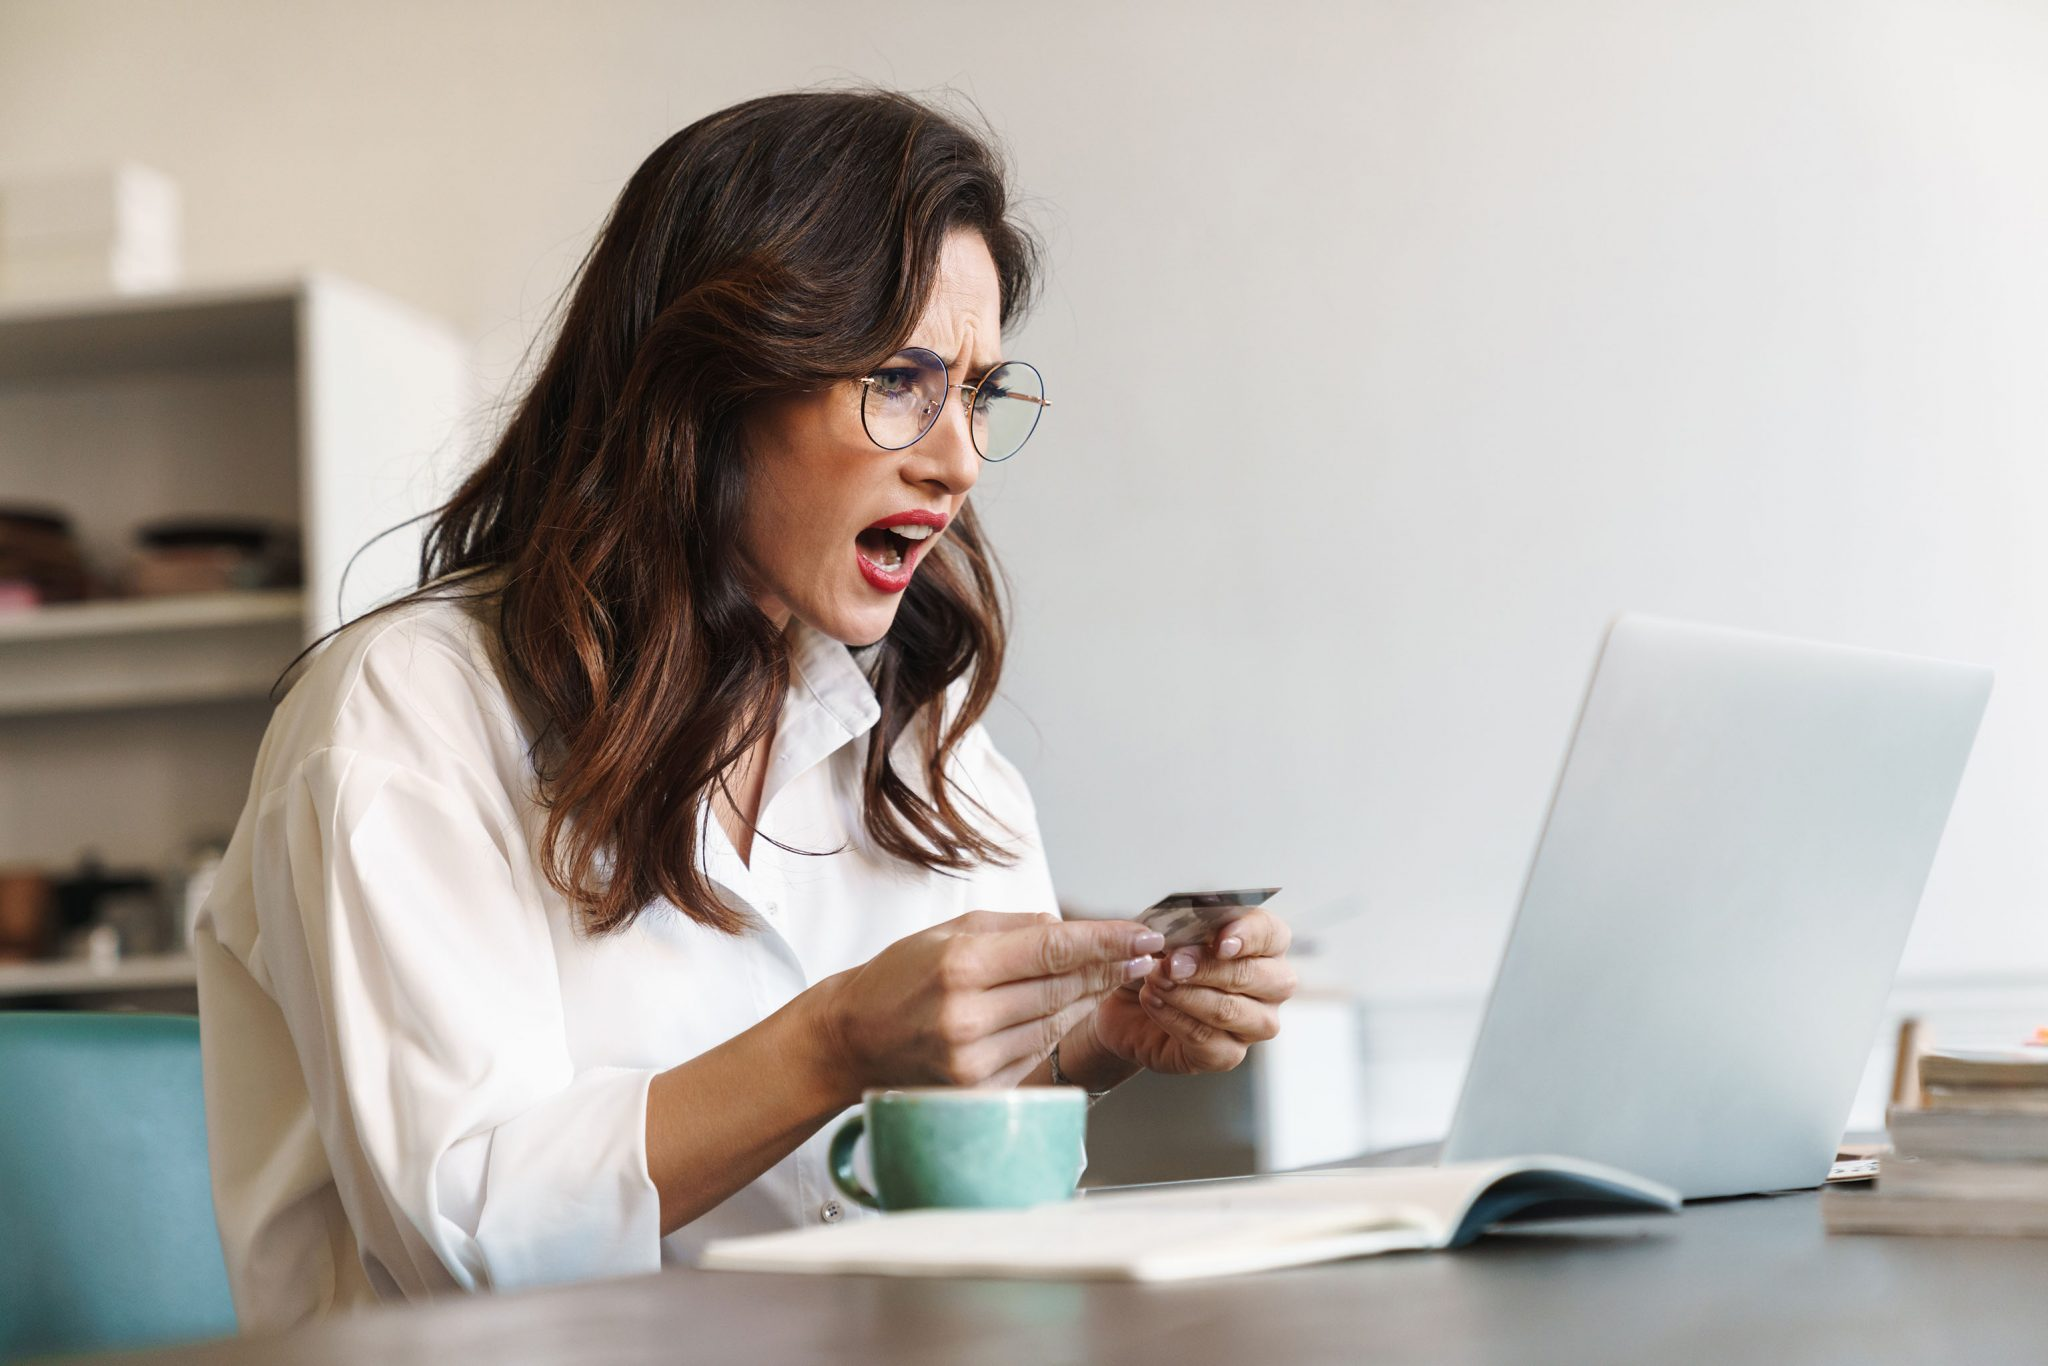 online-shopping-dissatisfaction